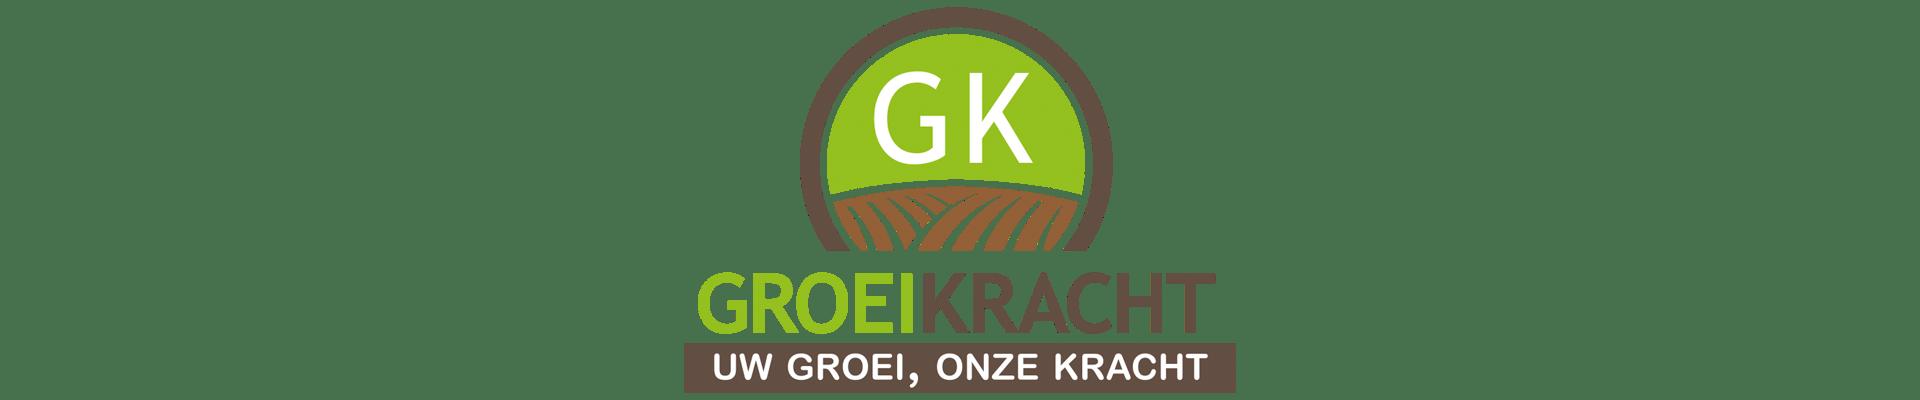 Loonbedrijf Kennes Groeikracht logo met slogan